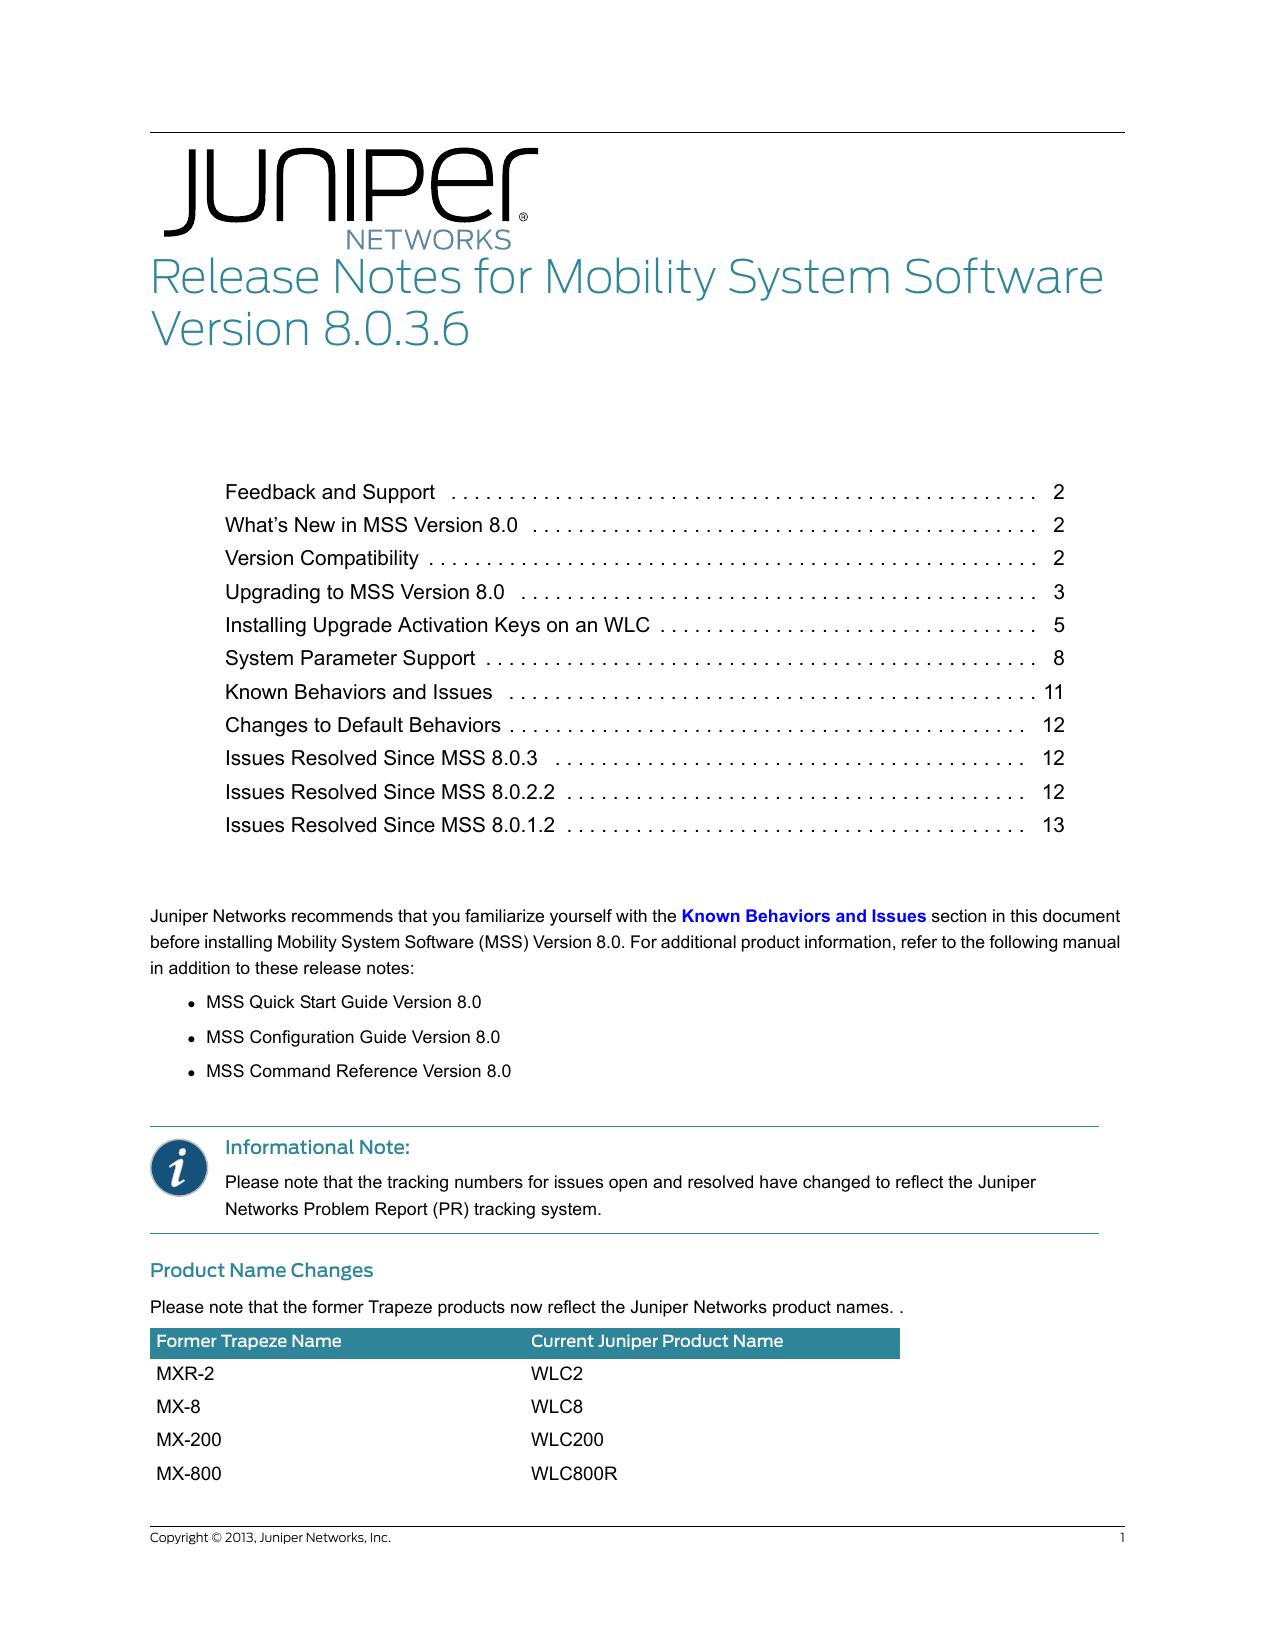 Juniper Networks Wiki